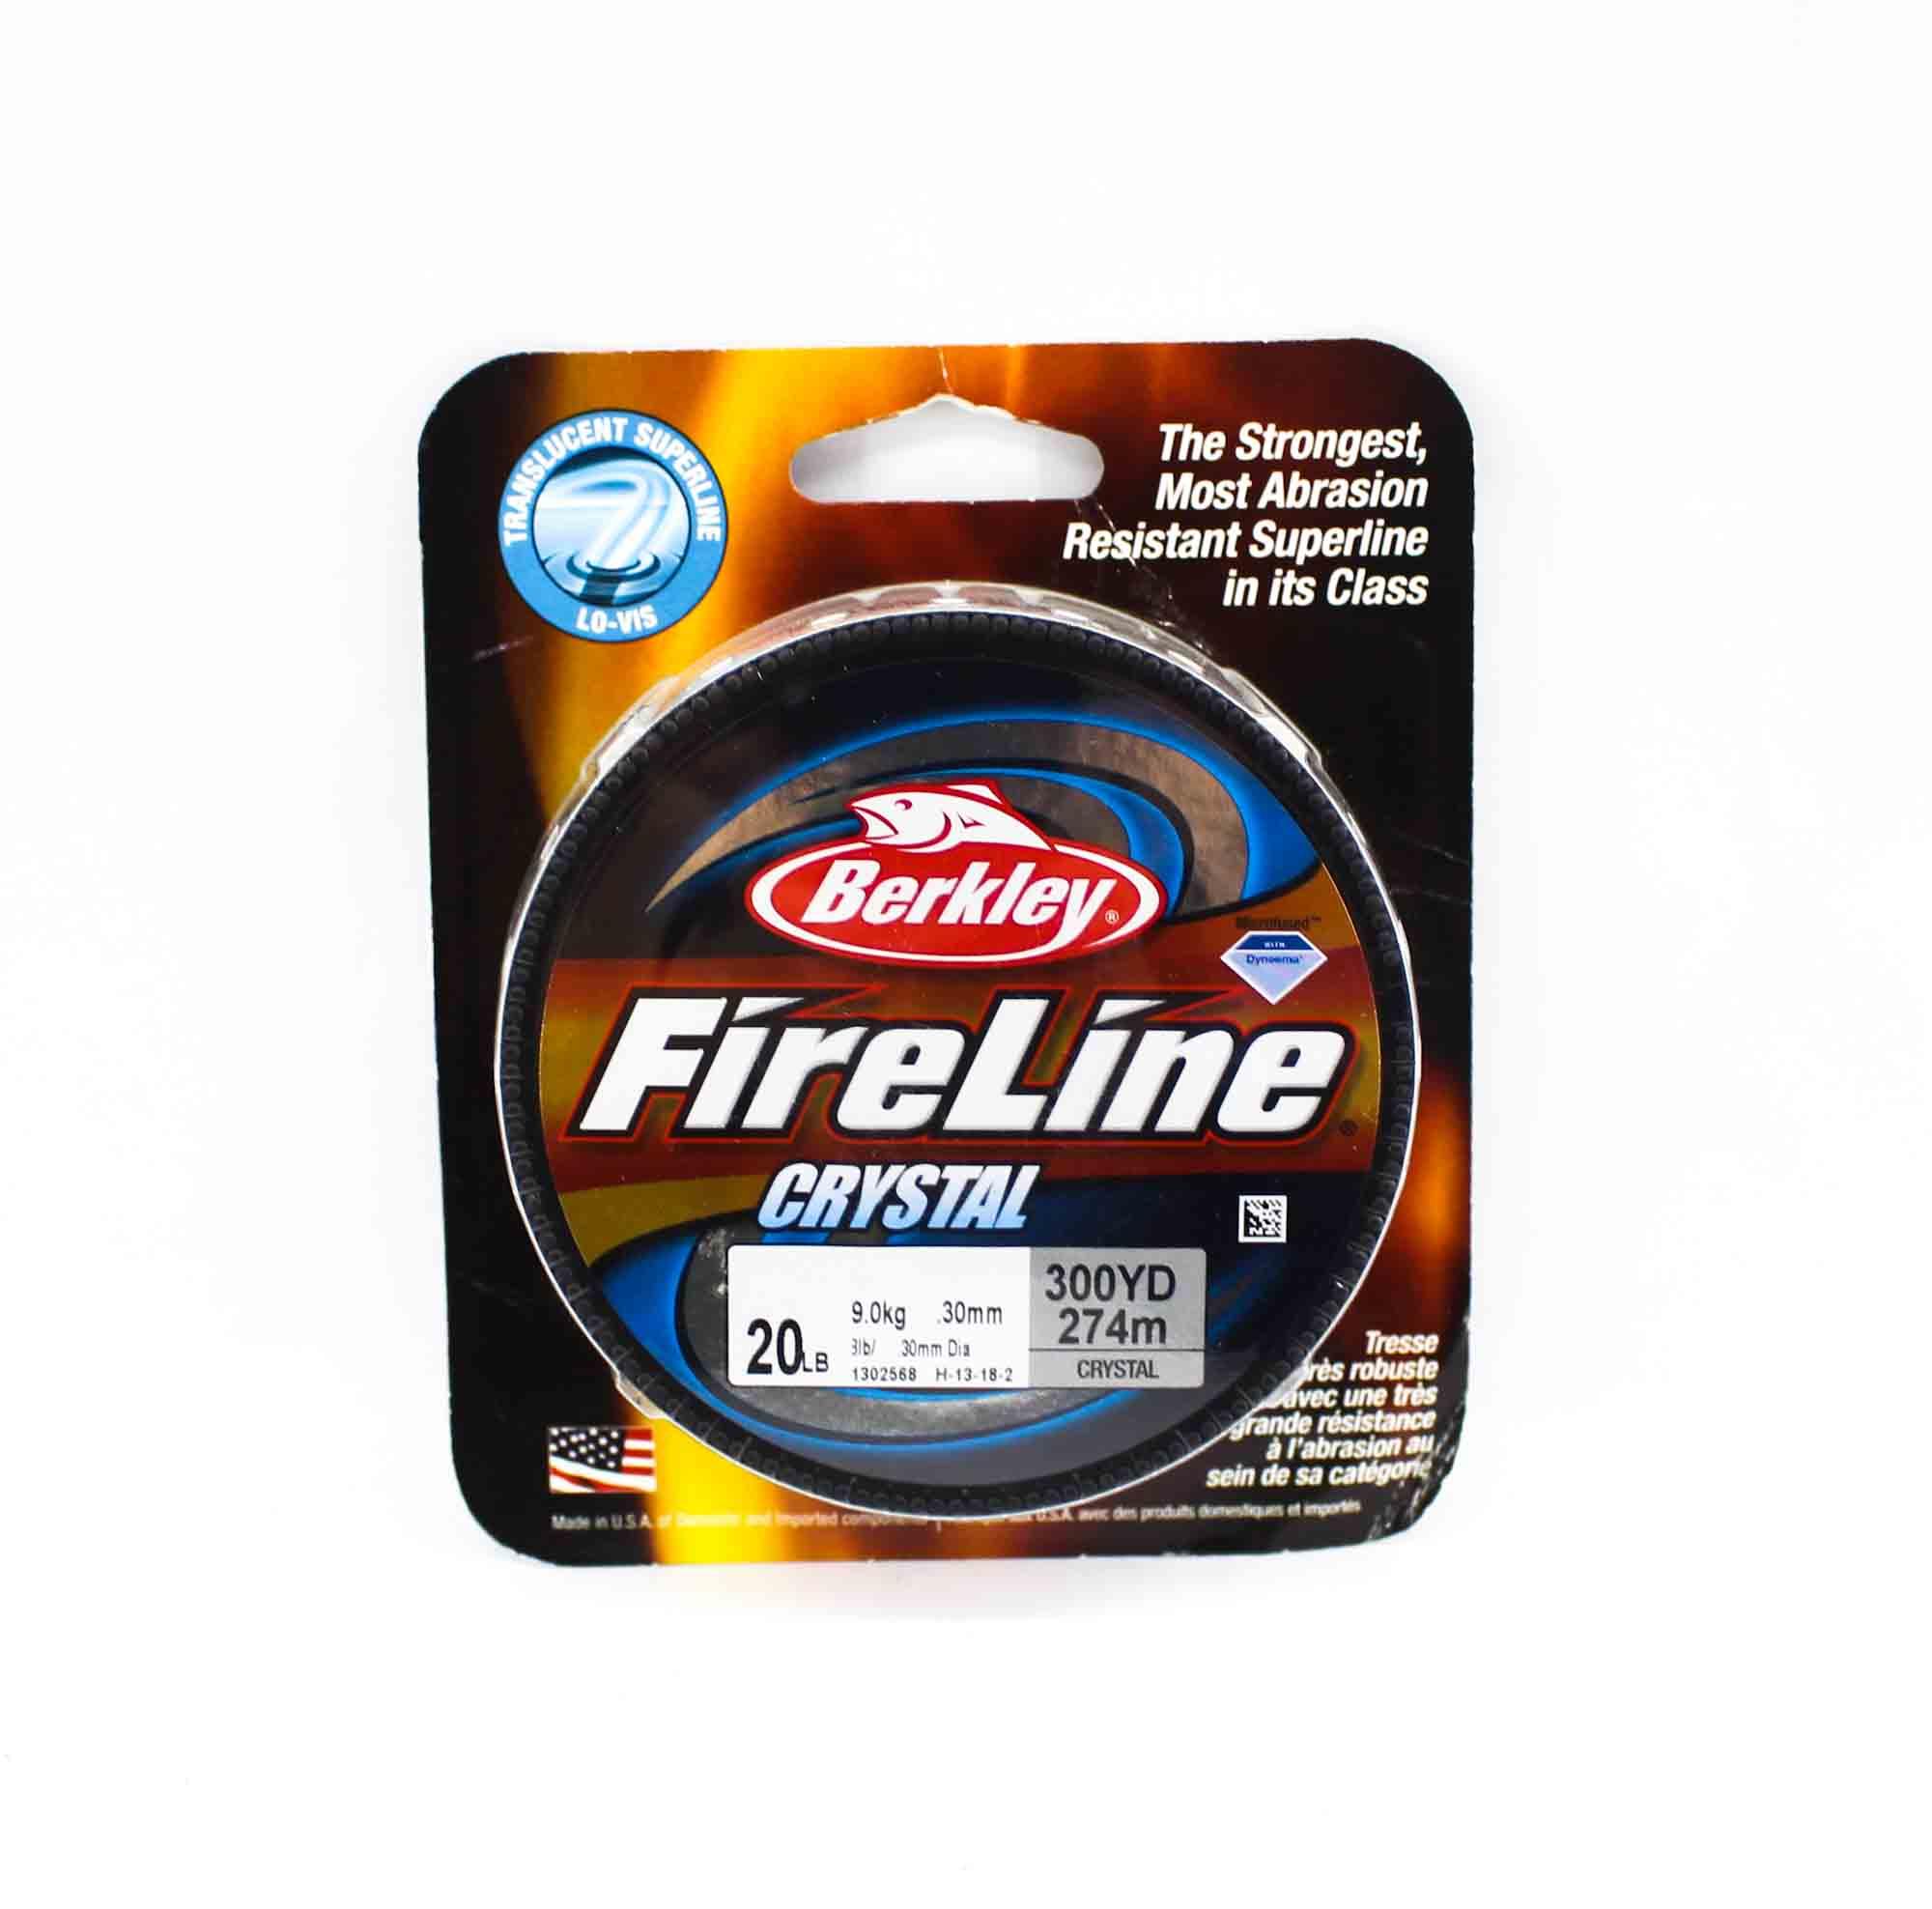 Berkley Fused Fireline Crystal 300yds 20lb White (4935)